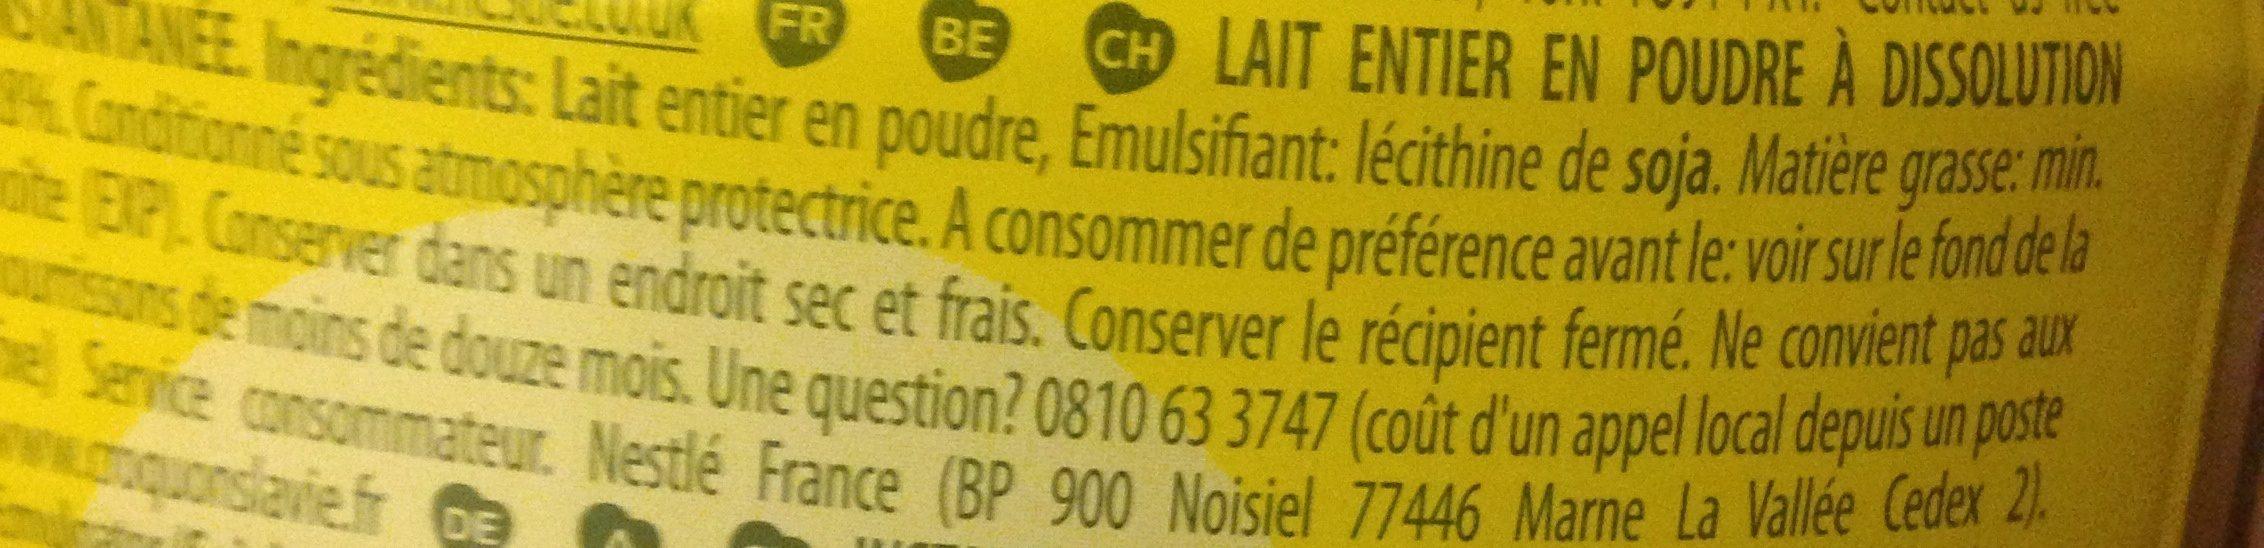 Instant Full Cream Milk Powder - Ingredients - fr